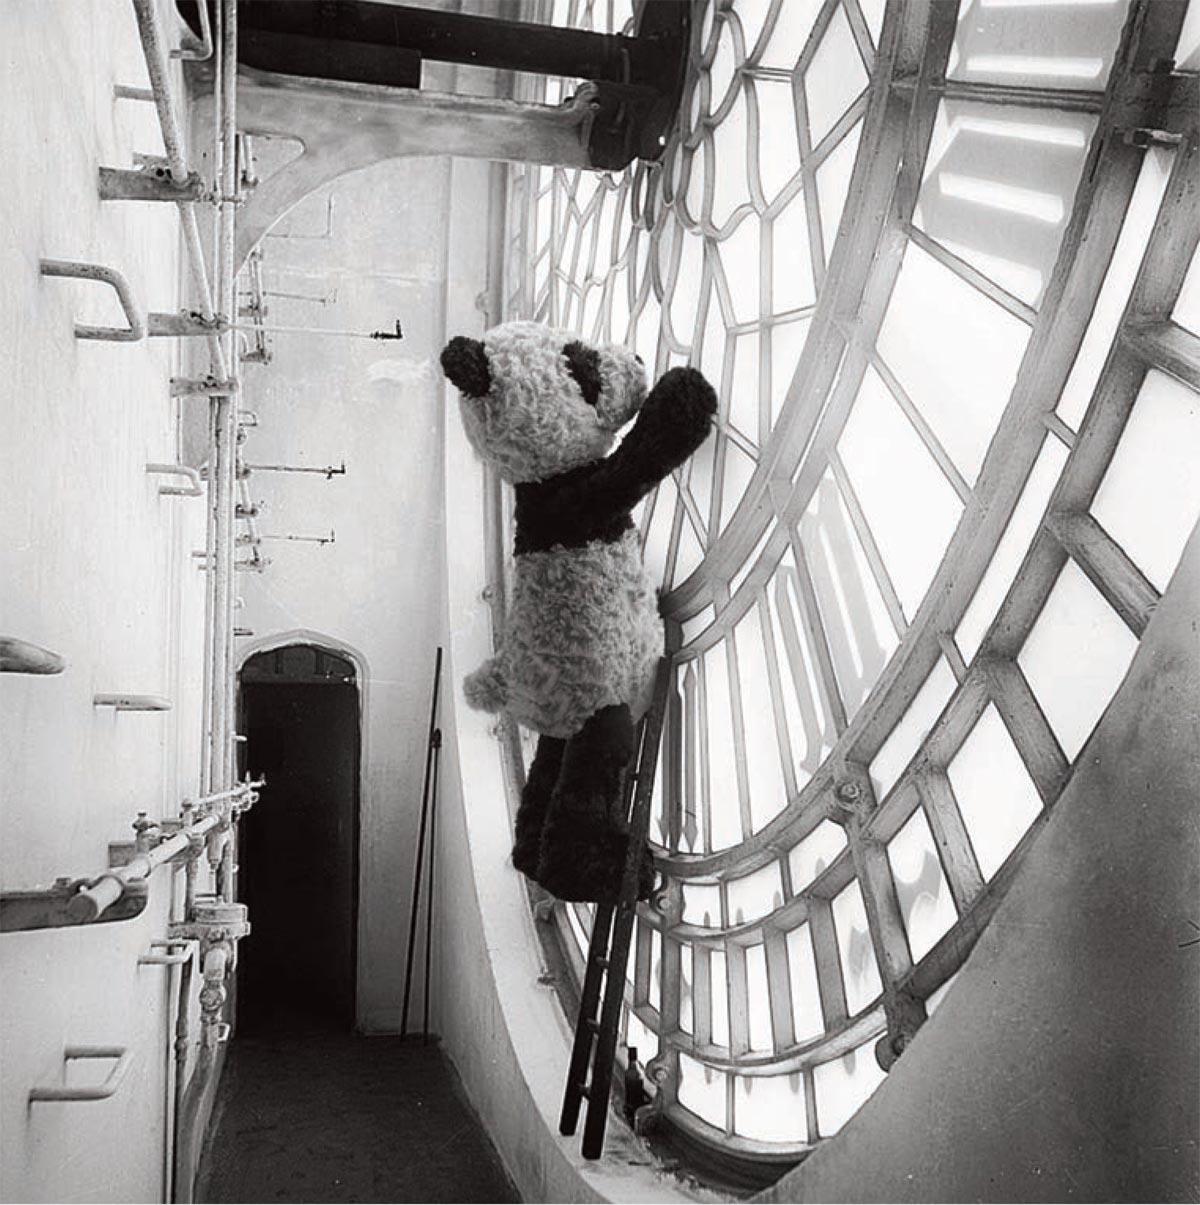 Panda Jellycat @bonjourbibiche